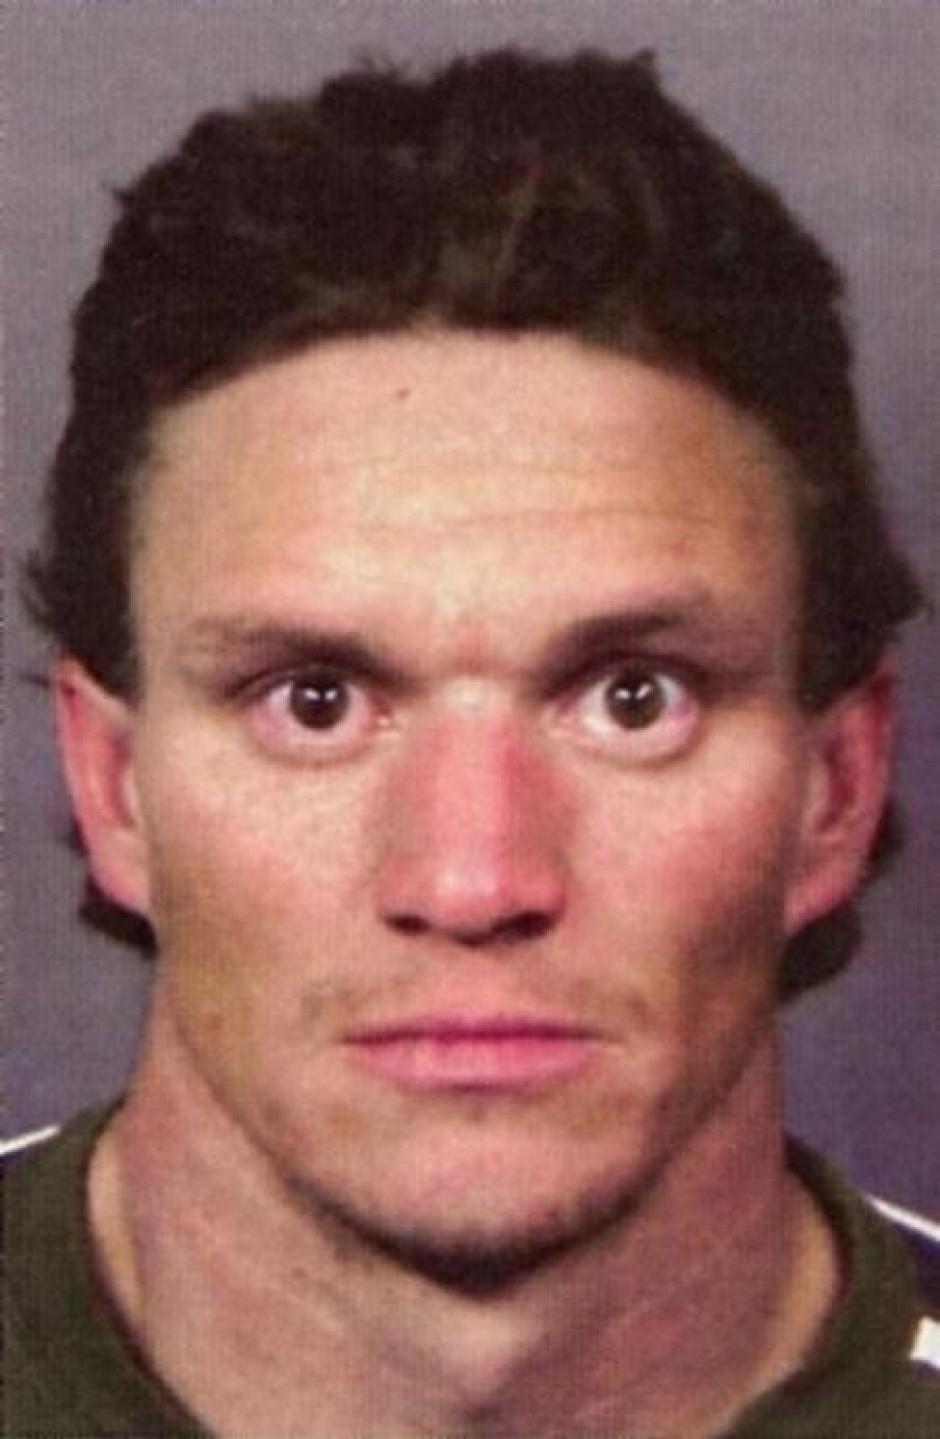 Edward Lee Leblanc era considerado un fugitivo peligroso. (Foto: FBI)